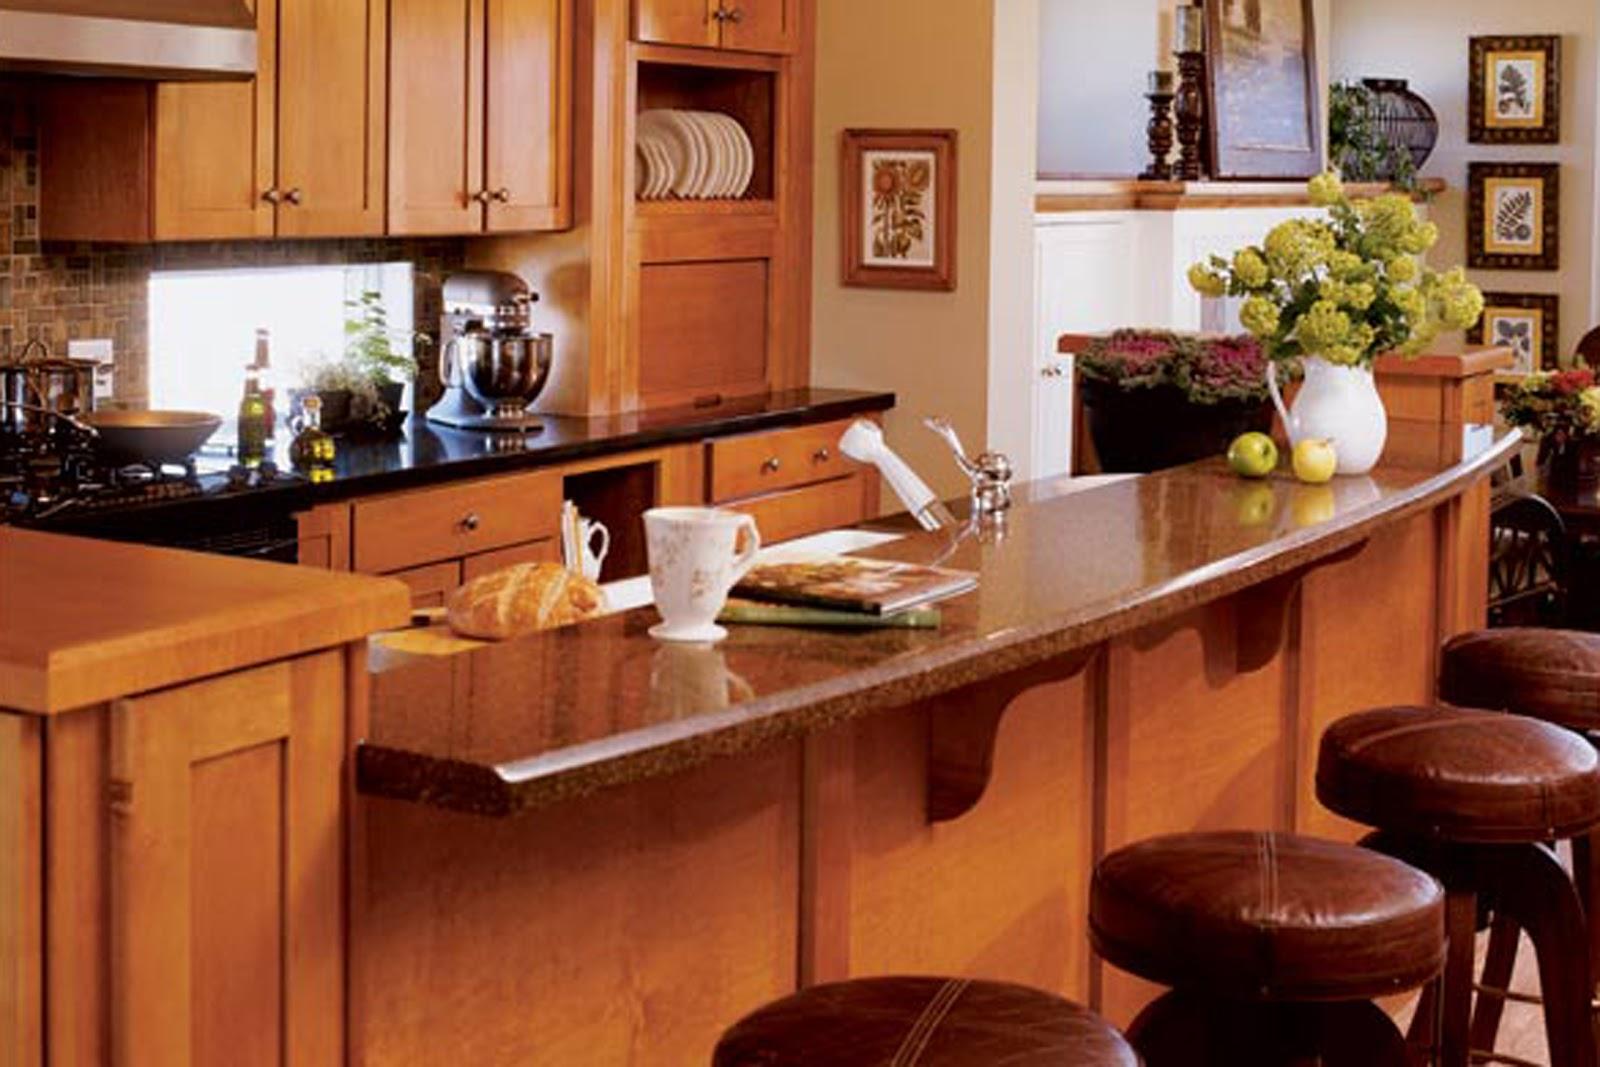 elegant home designs home design ideas tier kitchen island interior design decorating elegant kitchen cabinet island design ideas